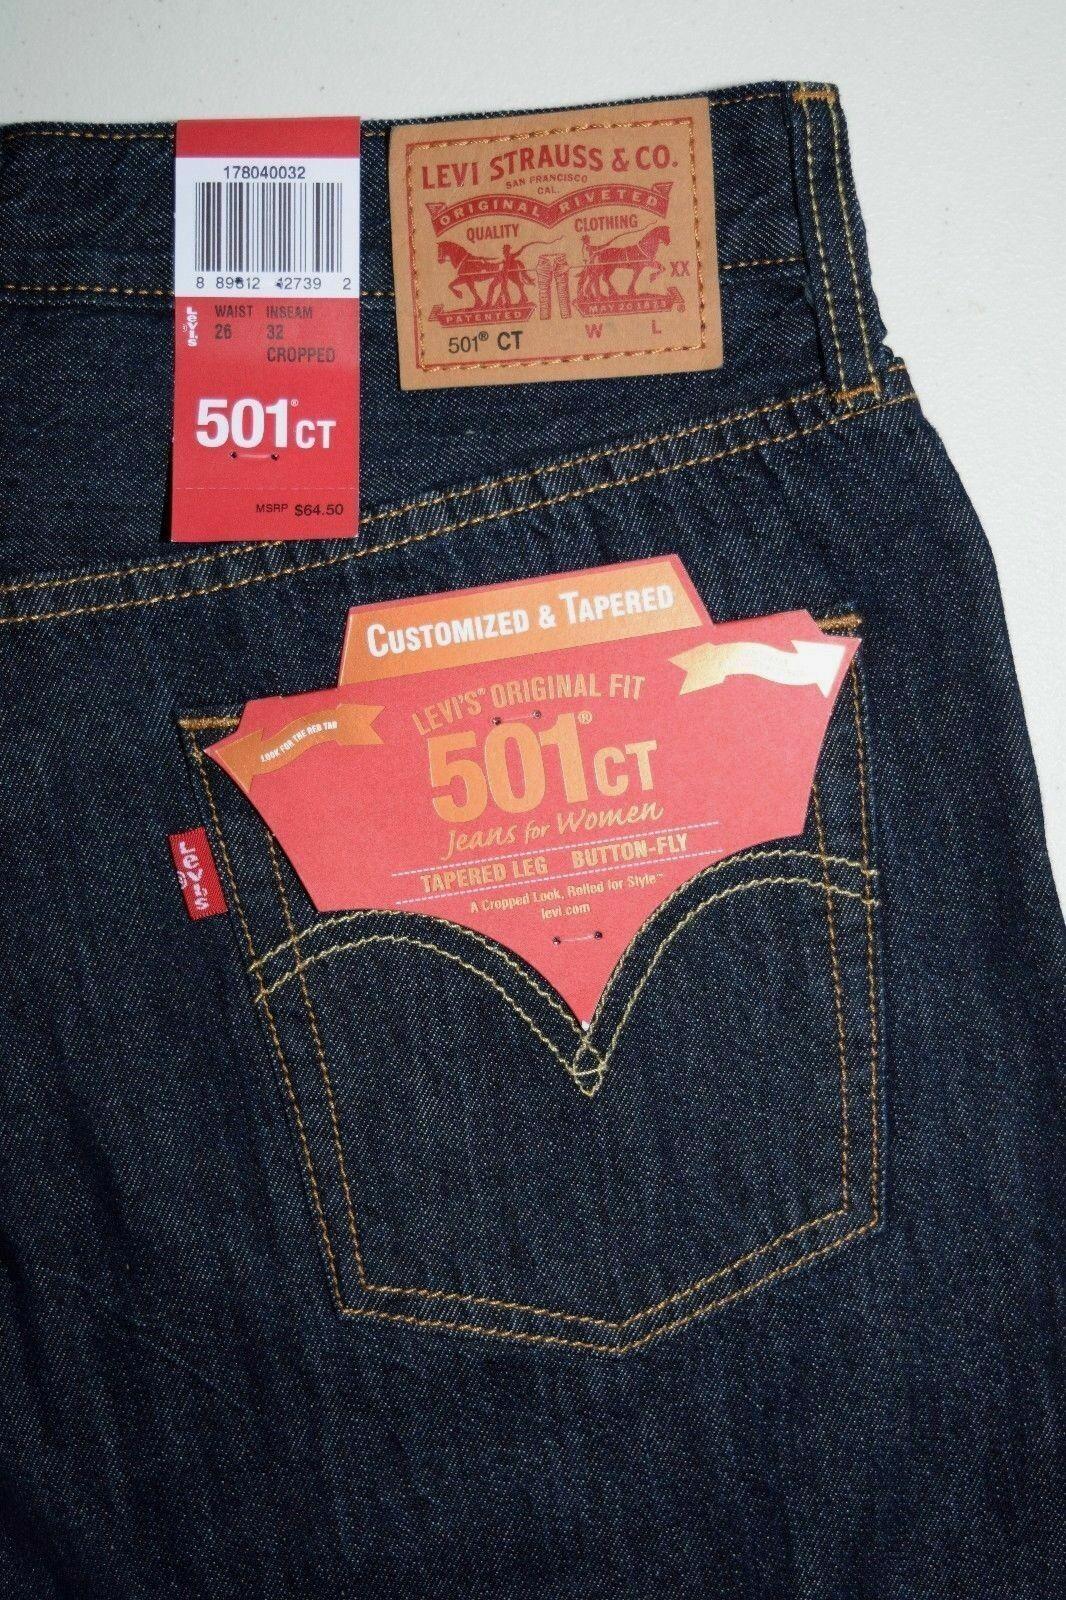 Women's Levi's 501 CT Customized Jeans